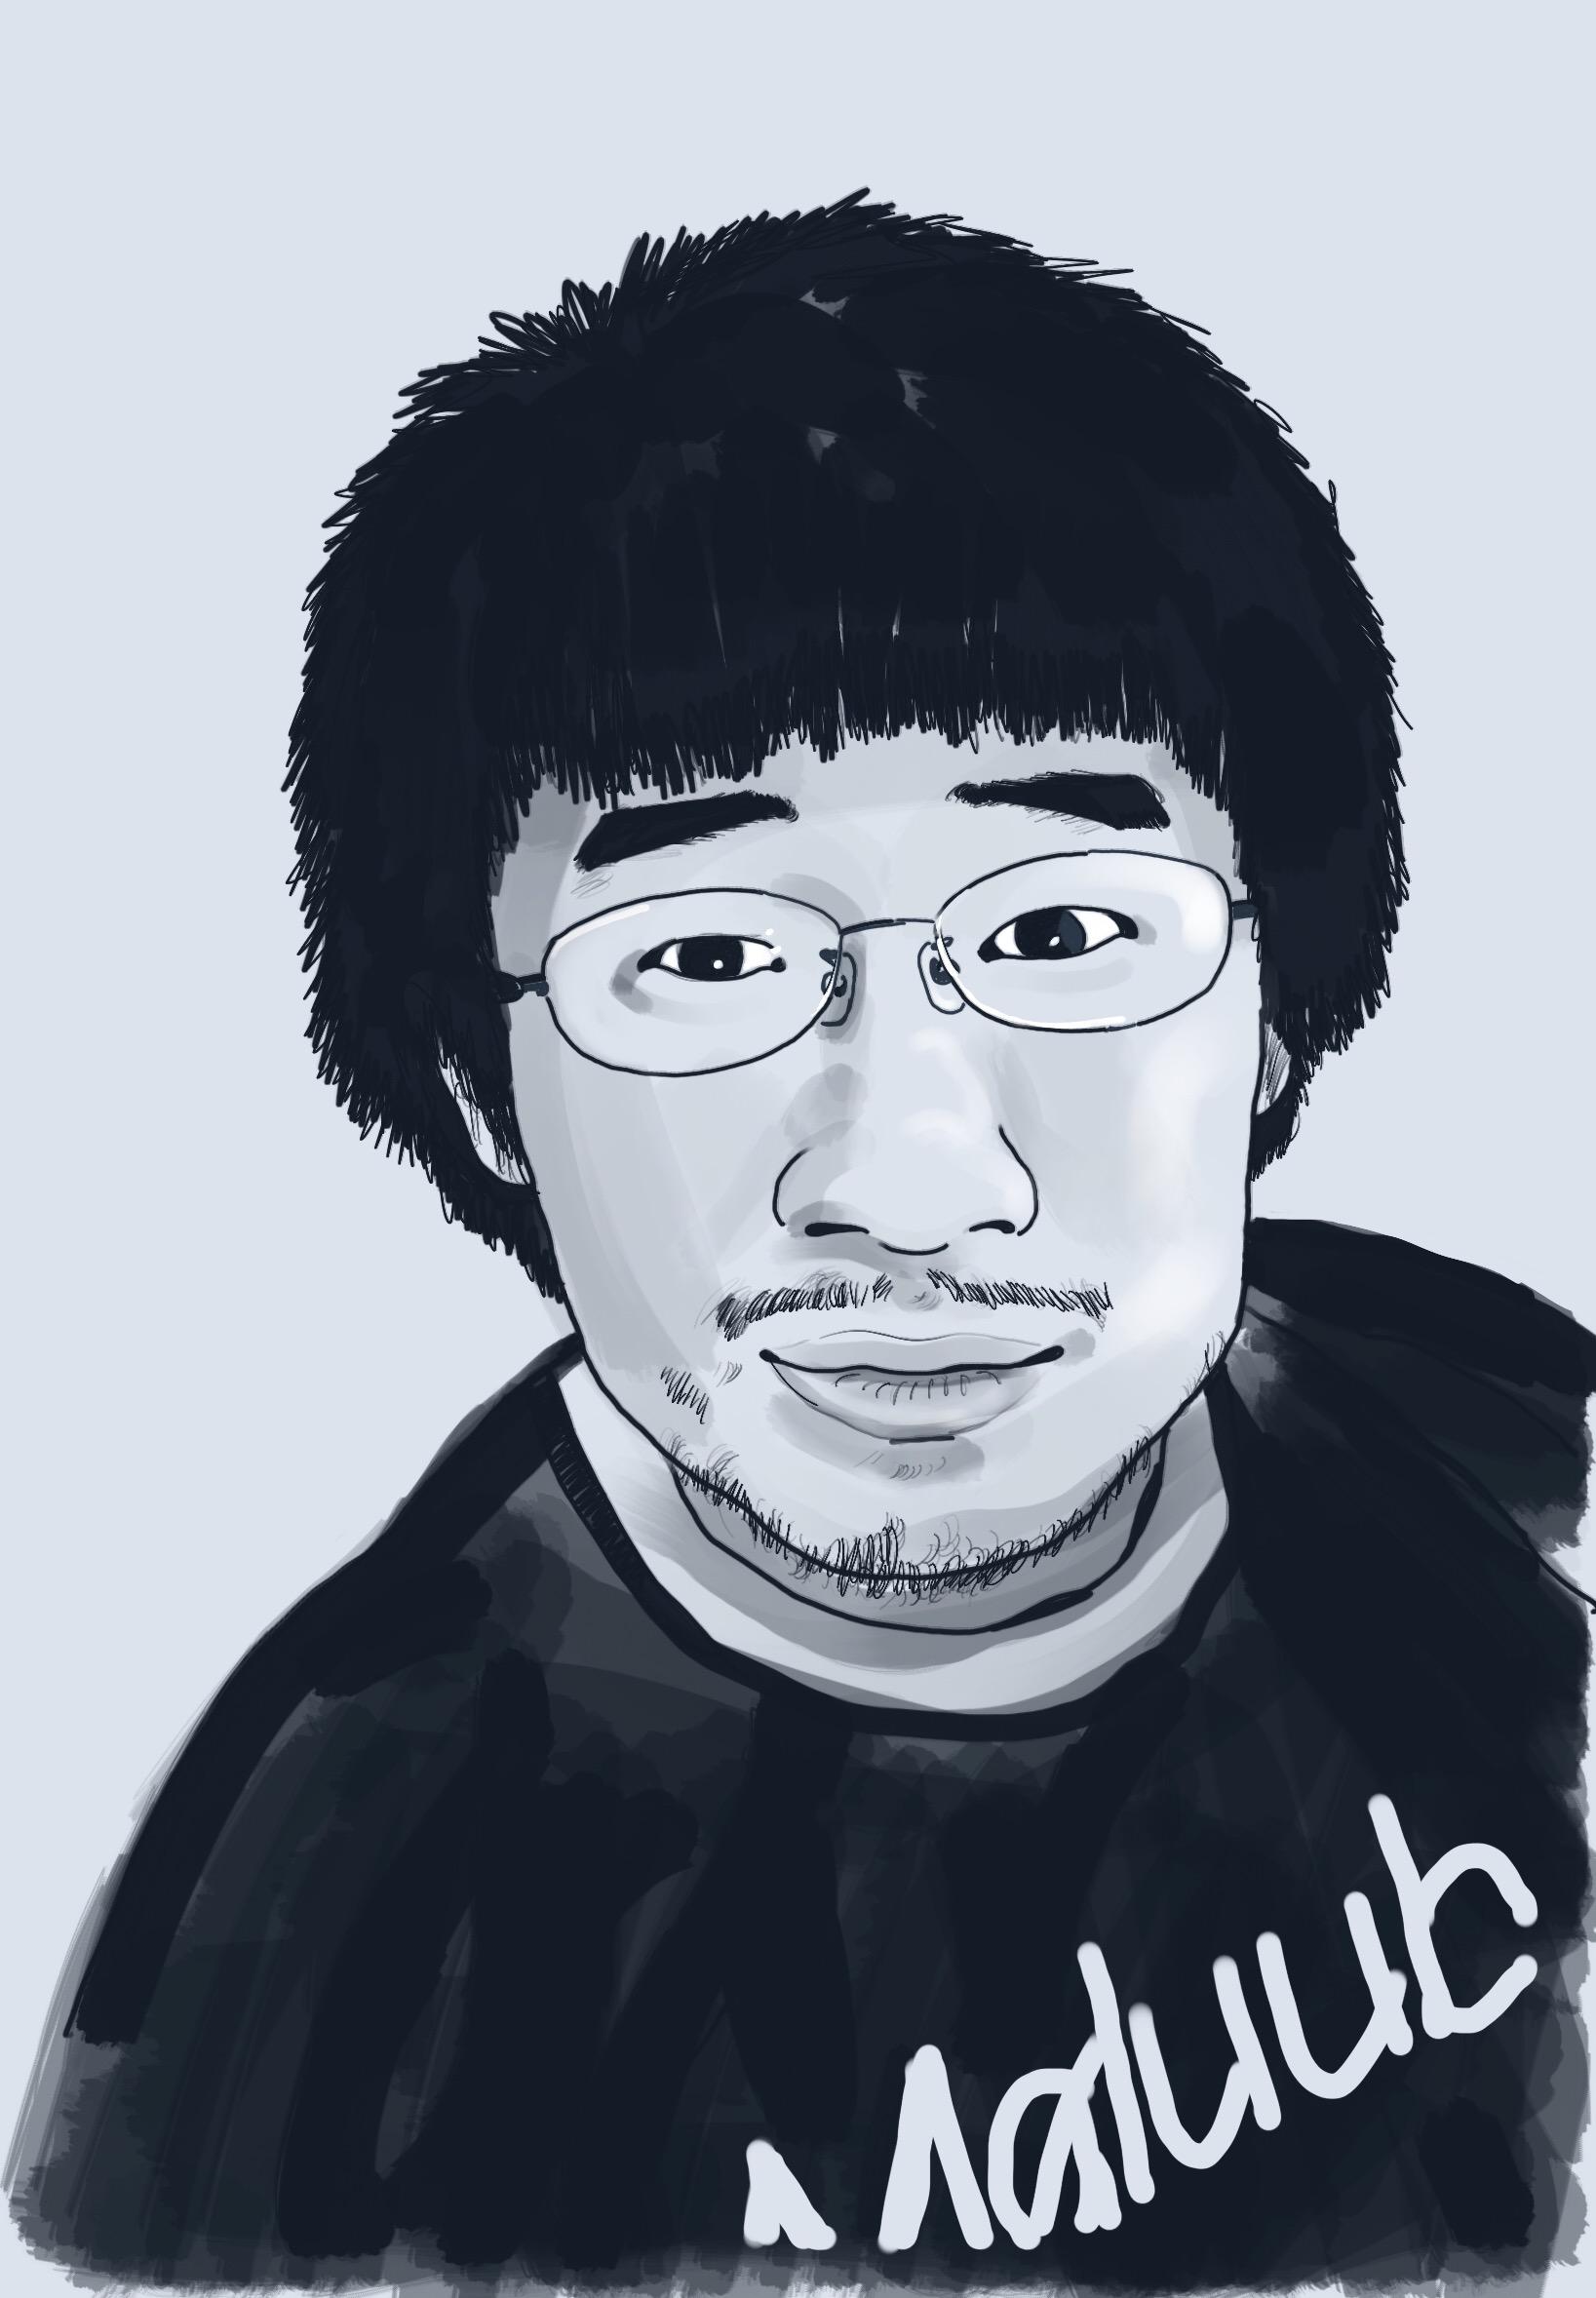 Xingdi (Eric) Yuan